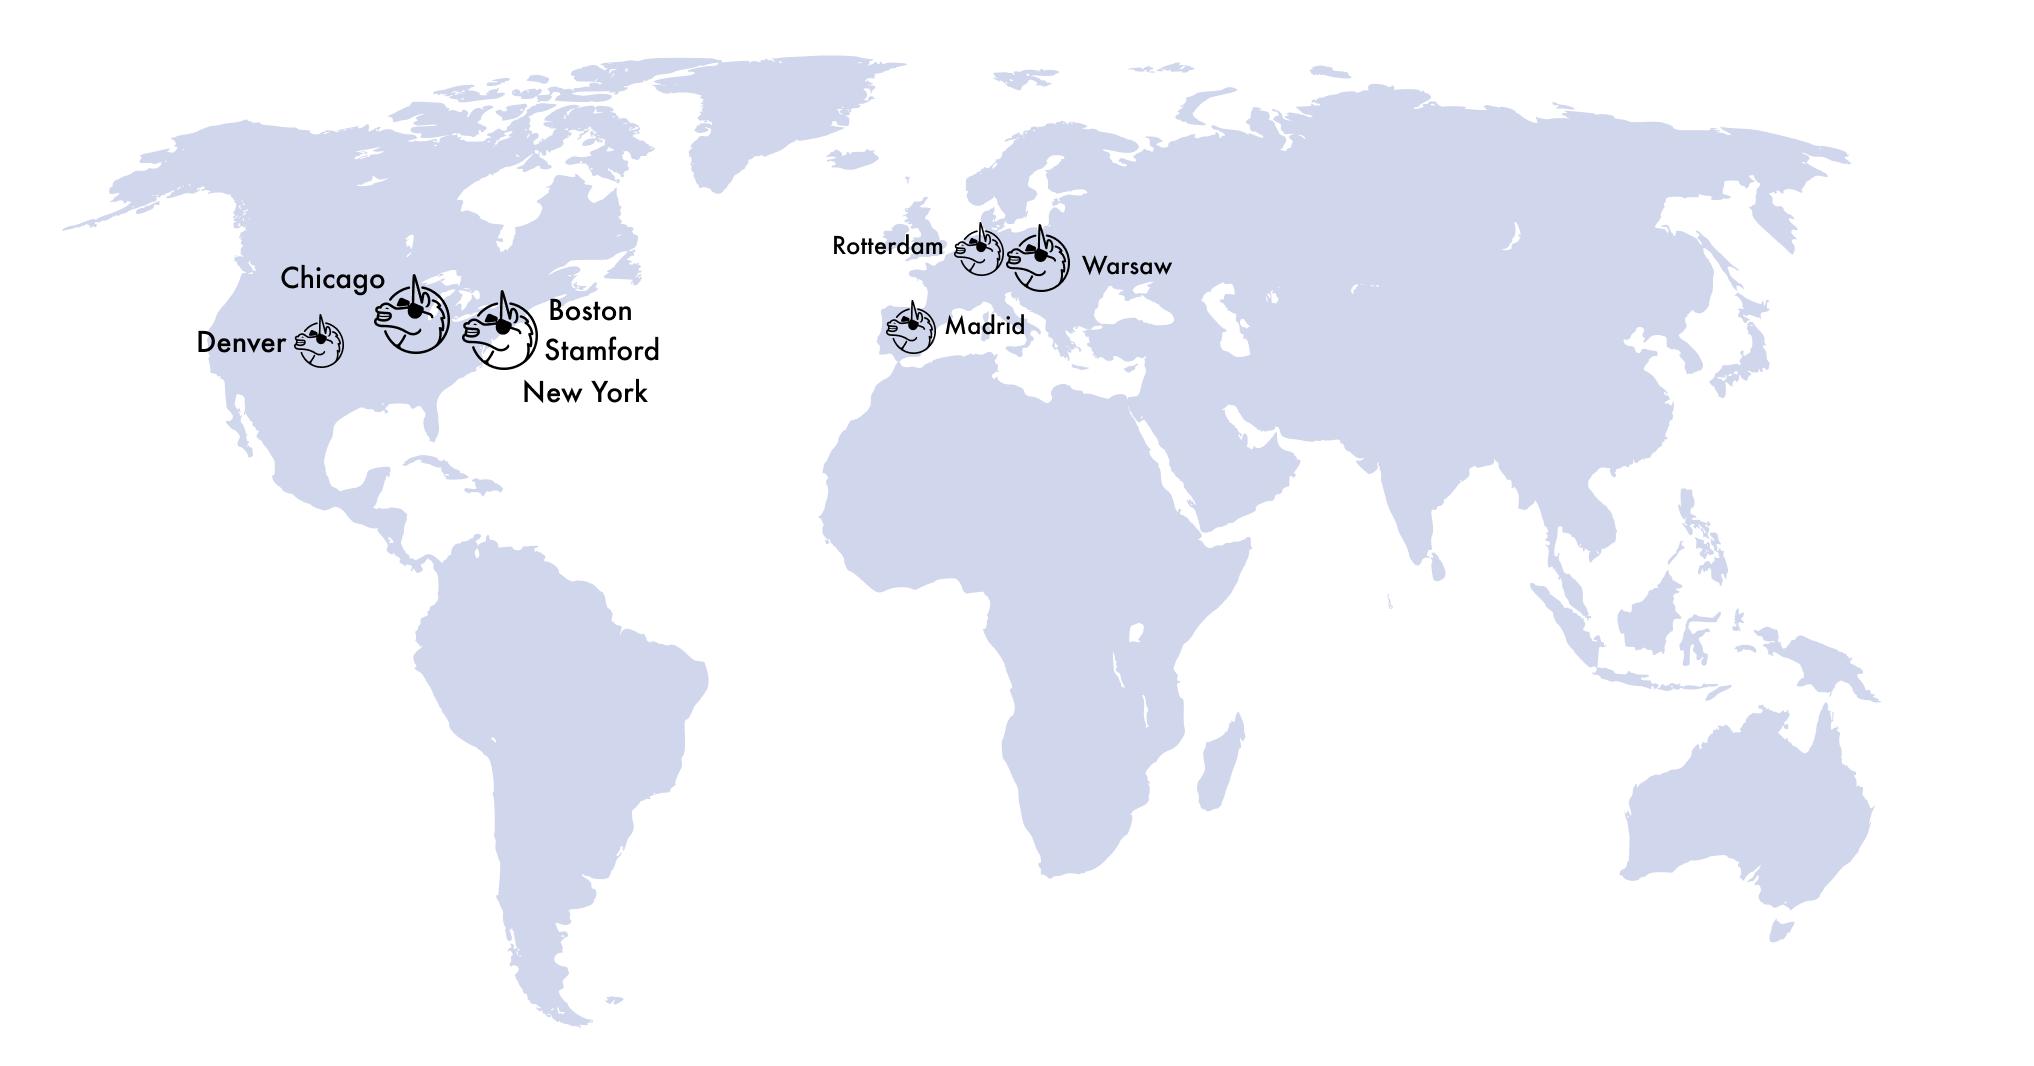 map of VGV team cities: New York, Chicago, Stamford, Boston, Denver, Warsaw, Rotterdam, and Madrid